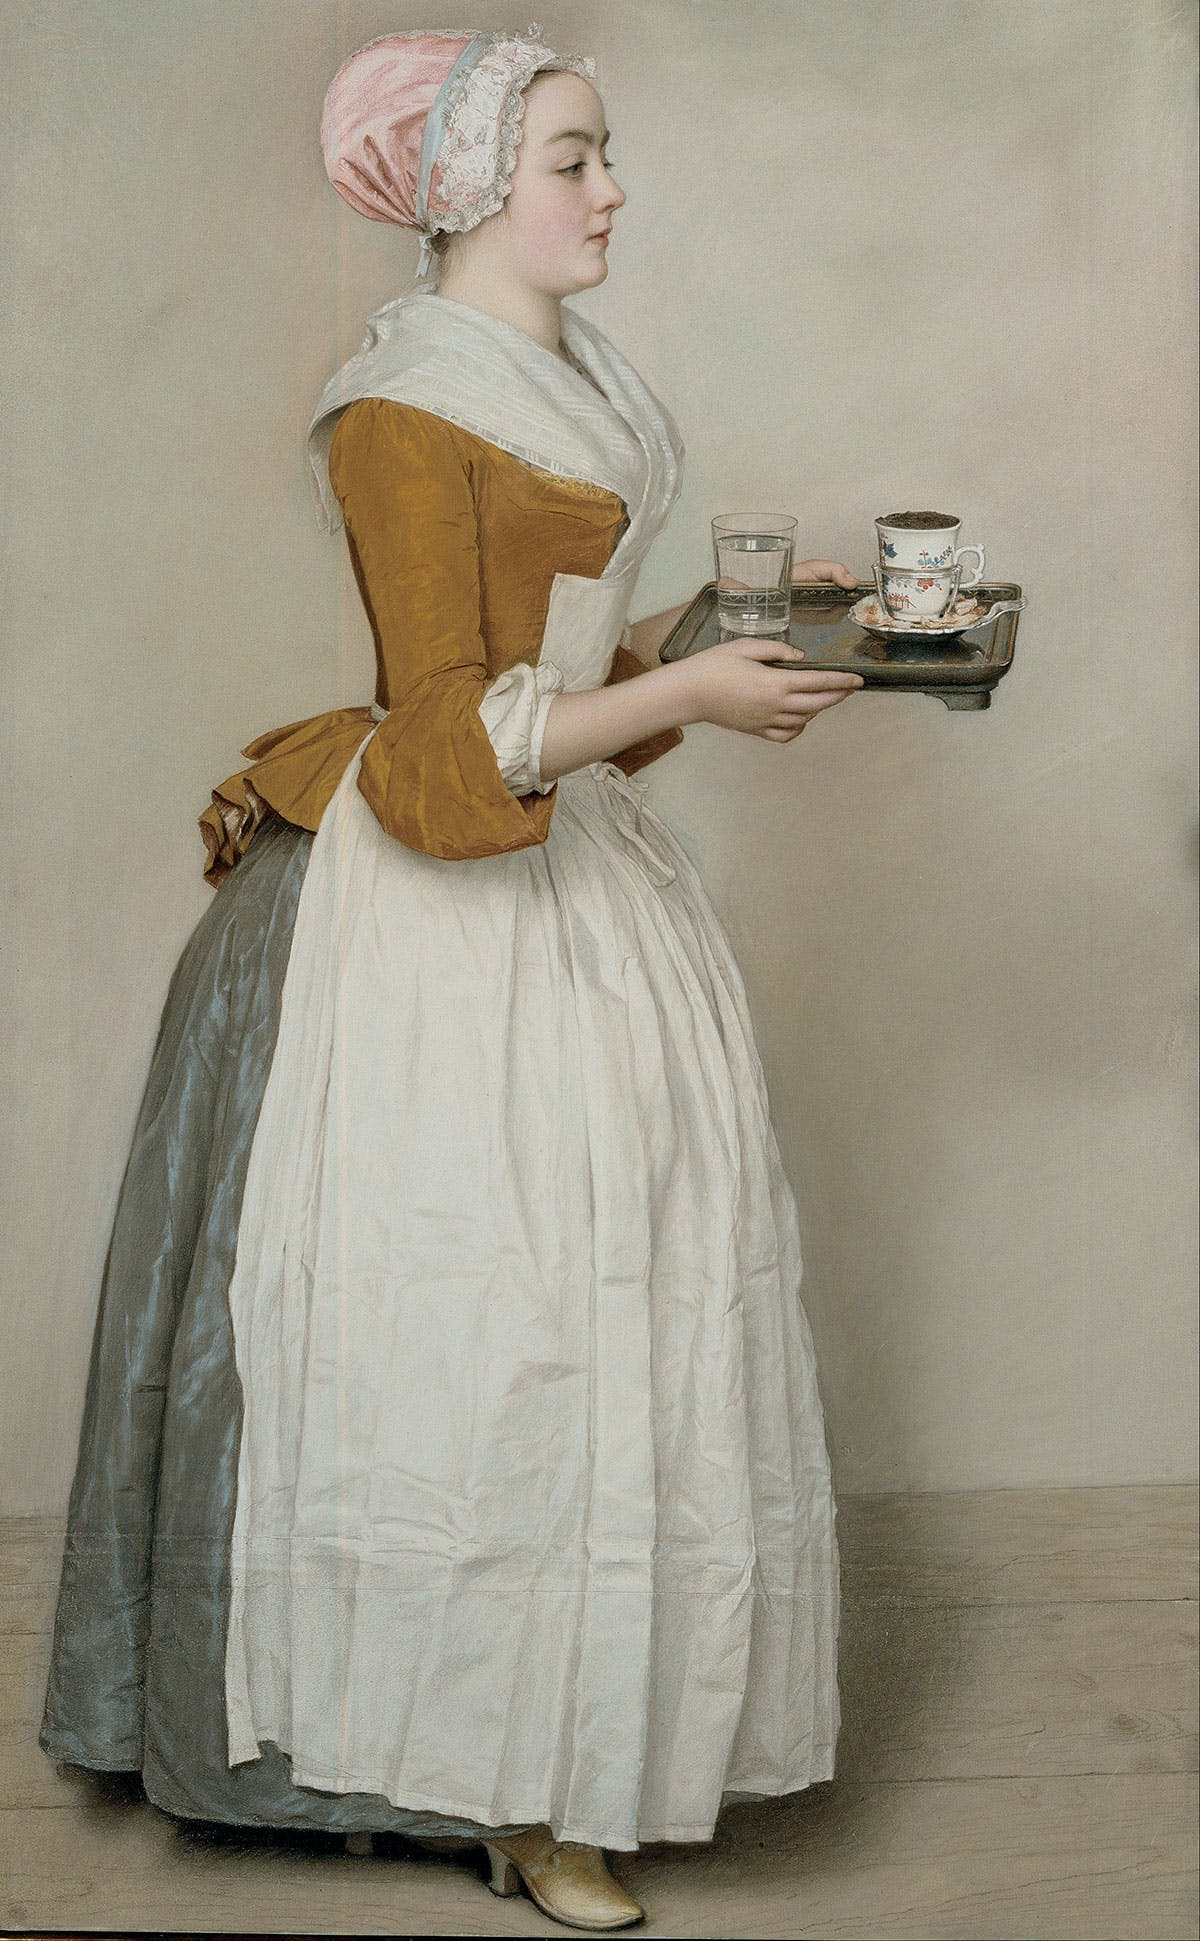 The Chocolate Girl (c. 1744), Jean-Étienne Liotard